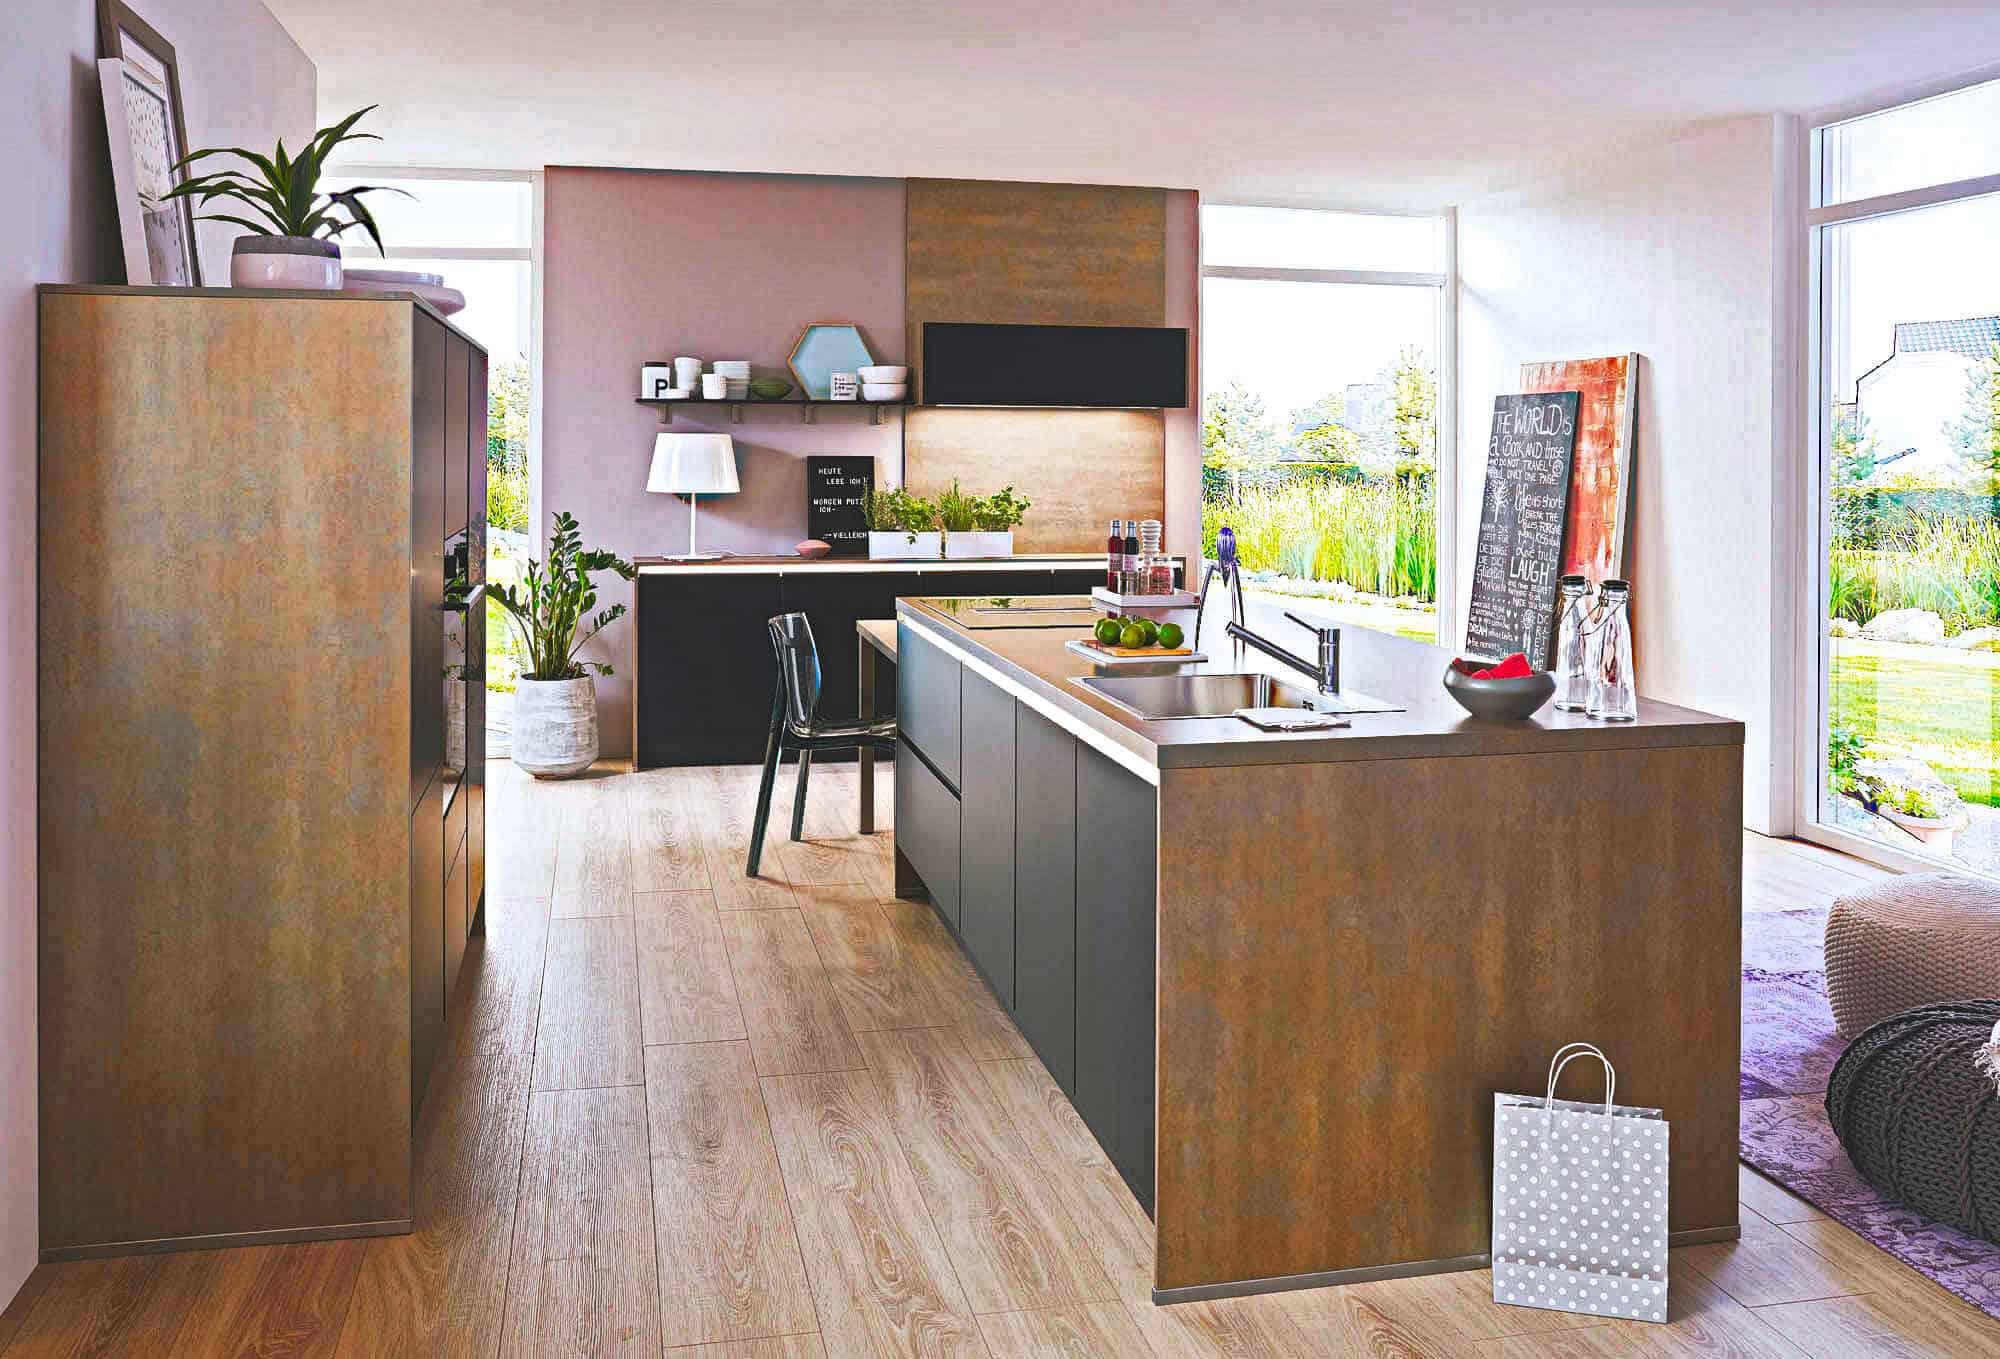 Industrial style kuchen gunstig kaufen kuchen borse for Elektrogrill gro e grillfl che